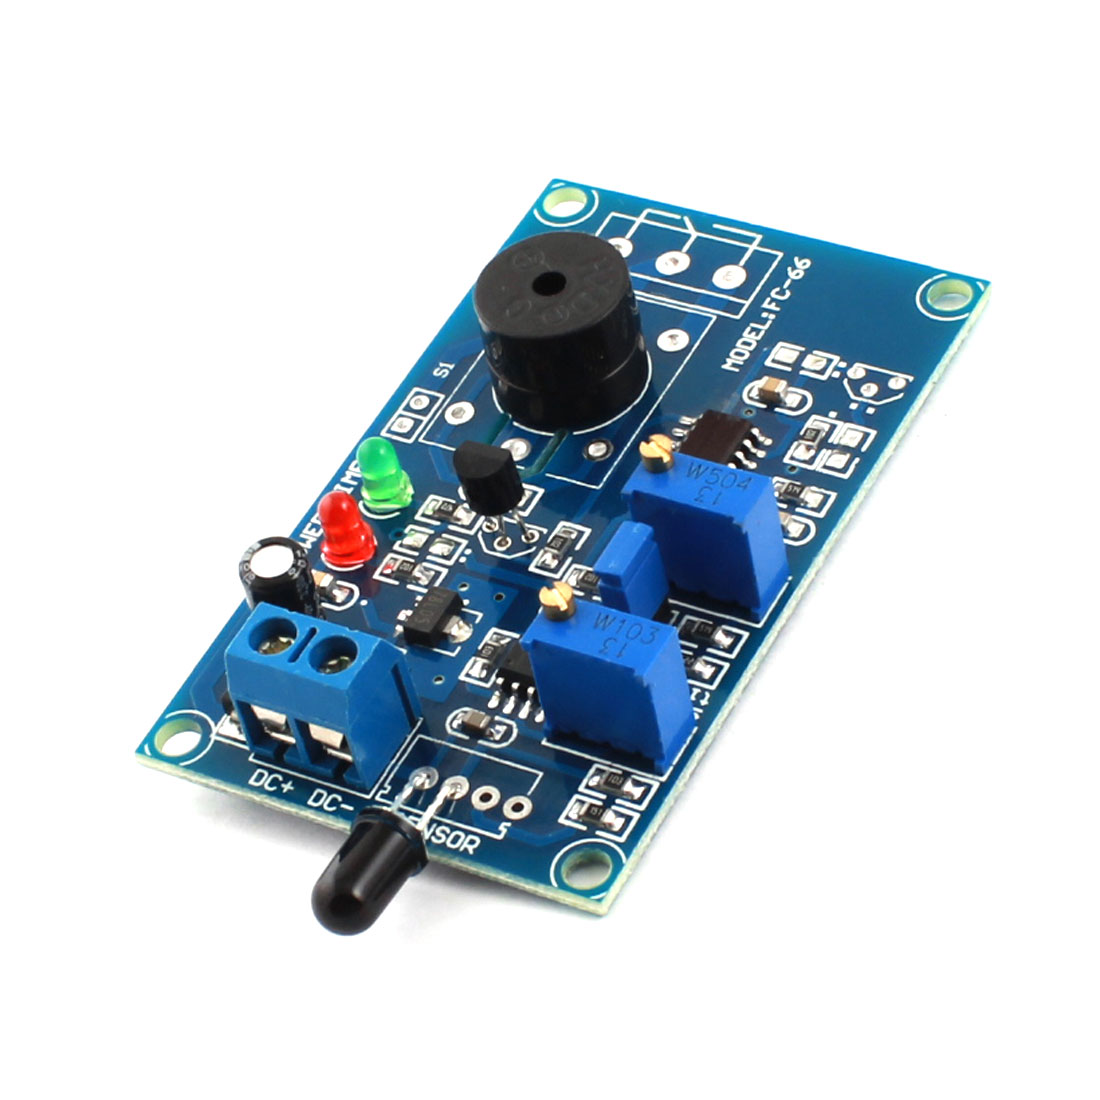 FC-66 DC12V Flame Sensor Fire Fighting Light Detection Alarm Buzzer Delay Module Green